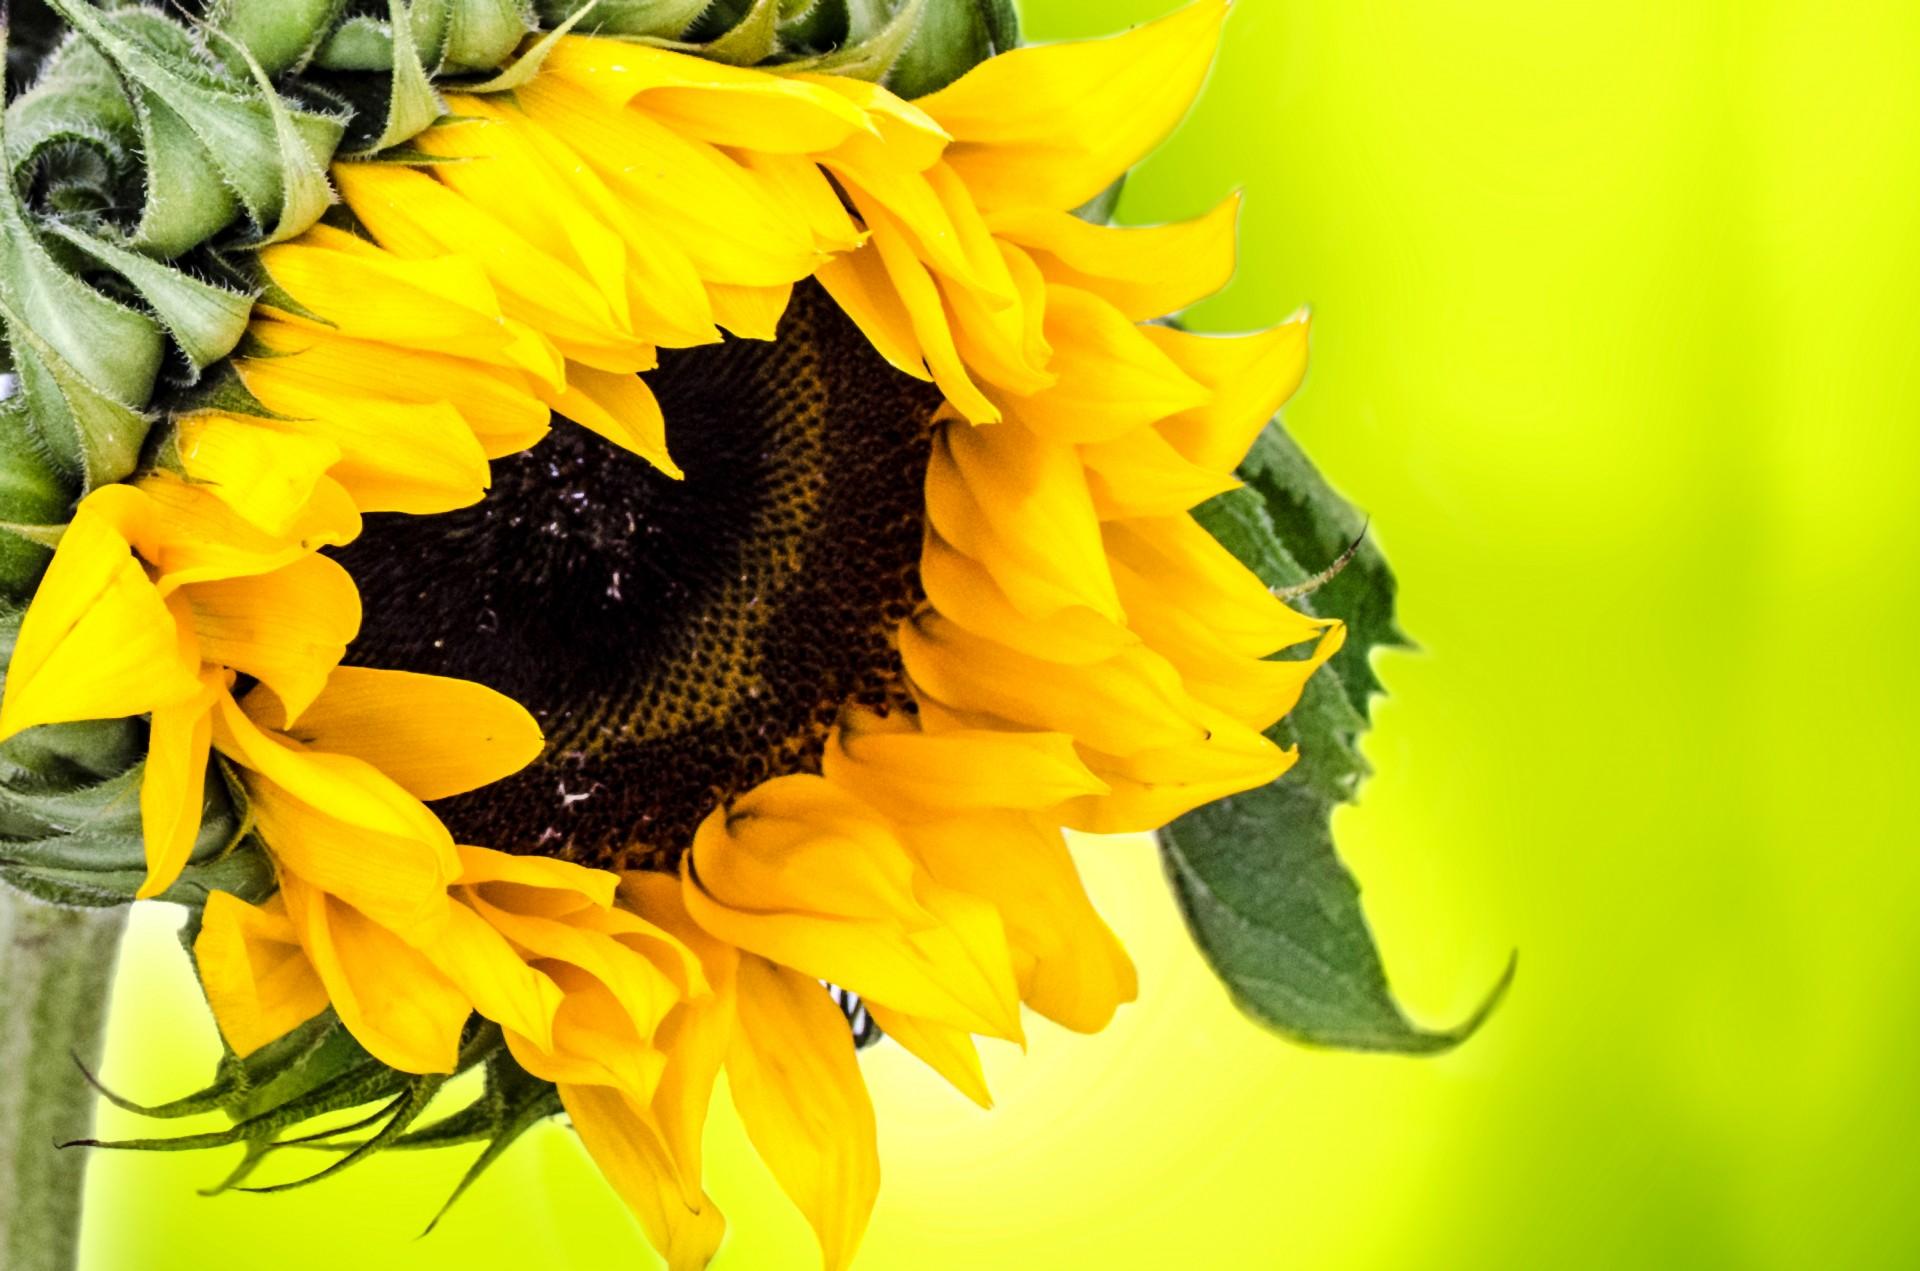 Sunflower Flowers Photo 35964186 Fanpop